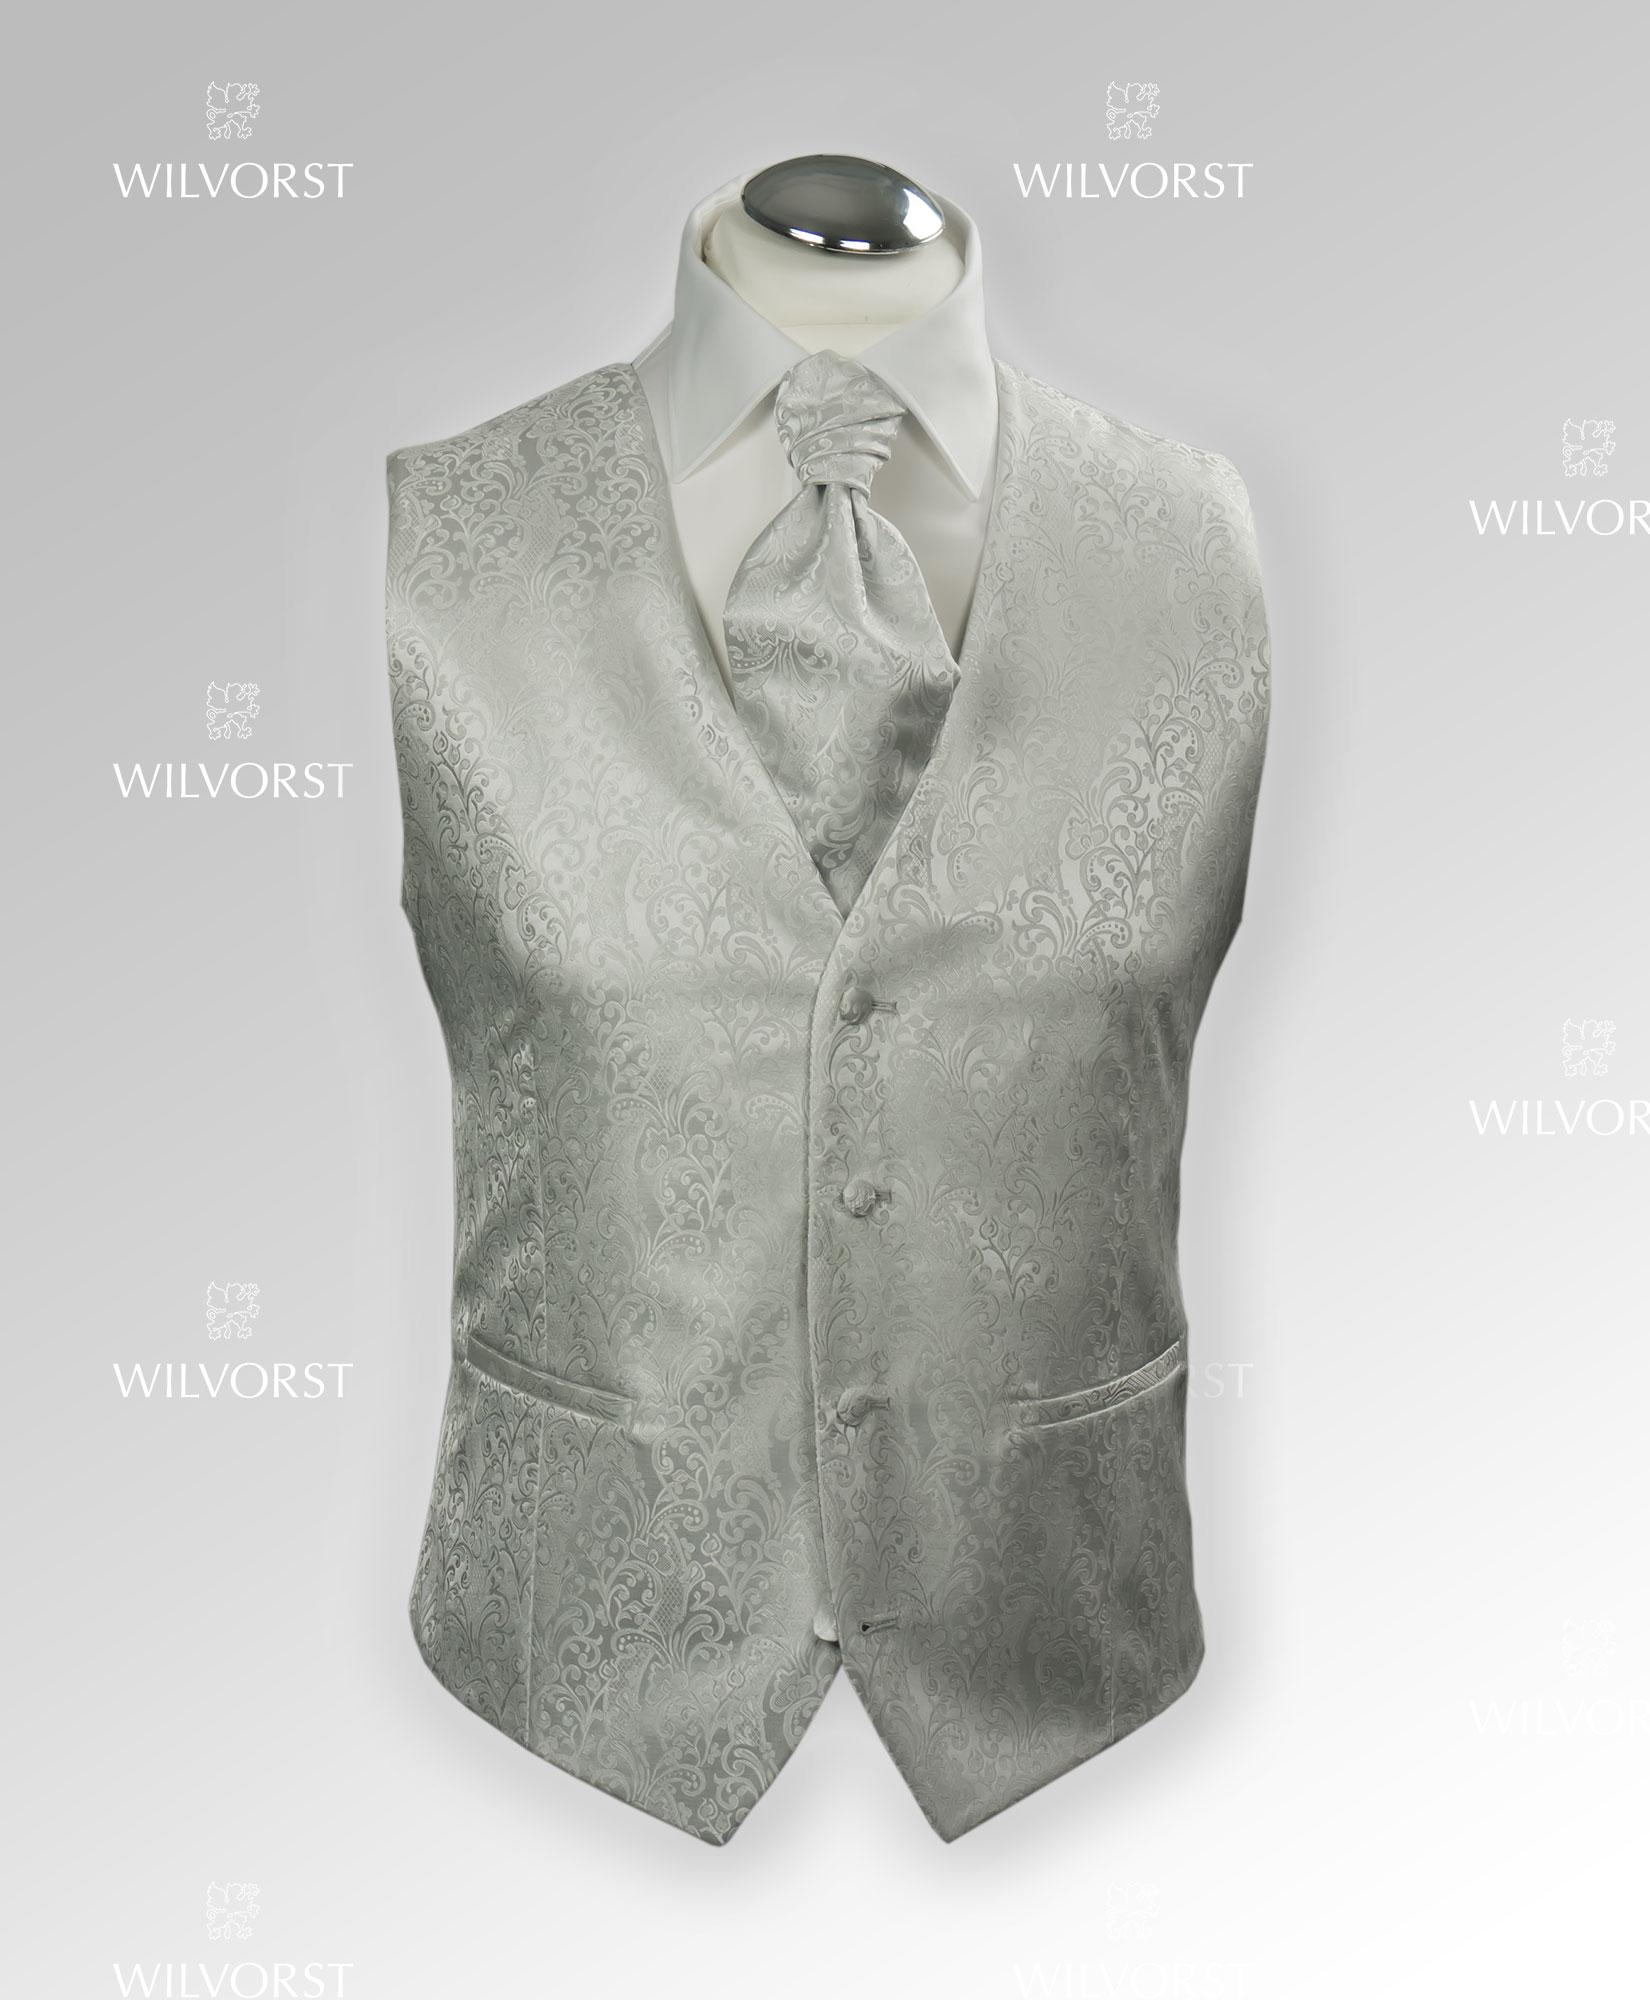 cerimonia Wilvorst slim grigio perla damascato con plastron coordinato